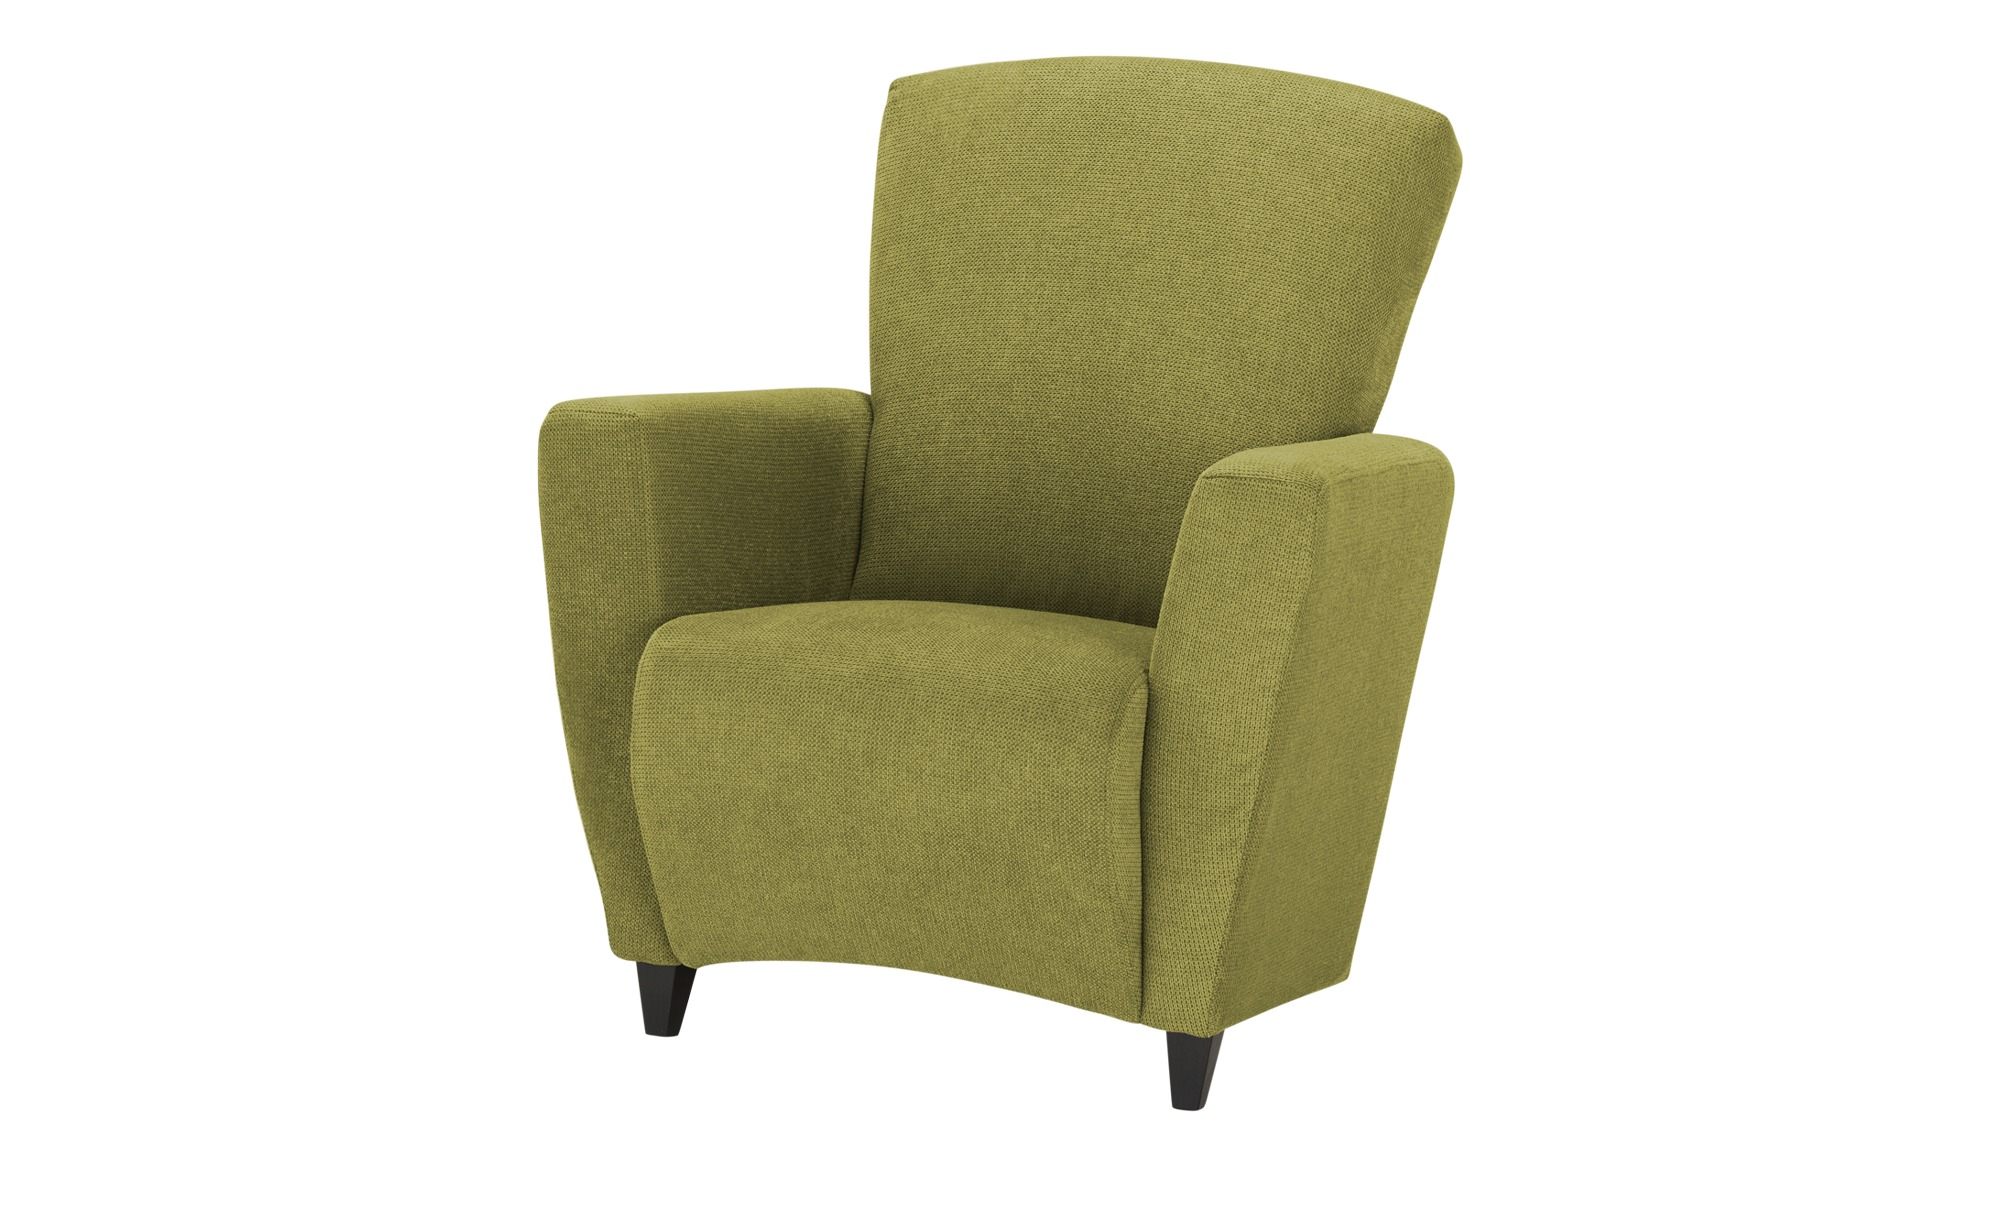 smart Sessel  Alma ¦ grün ¦ Maße (cm): B: 84 H: 94 T: 80 Polstermöbel > Sessel > Polstersessel - Höffner